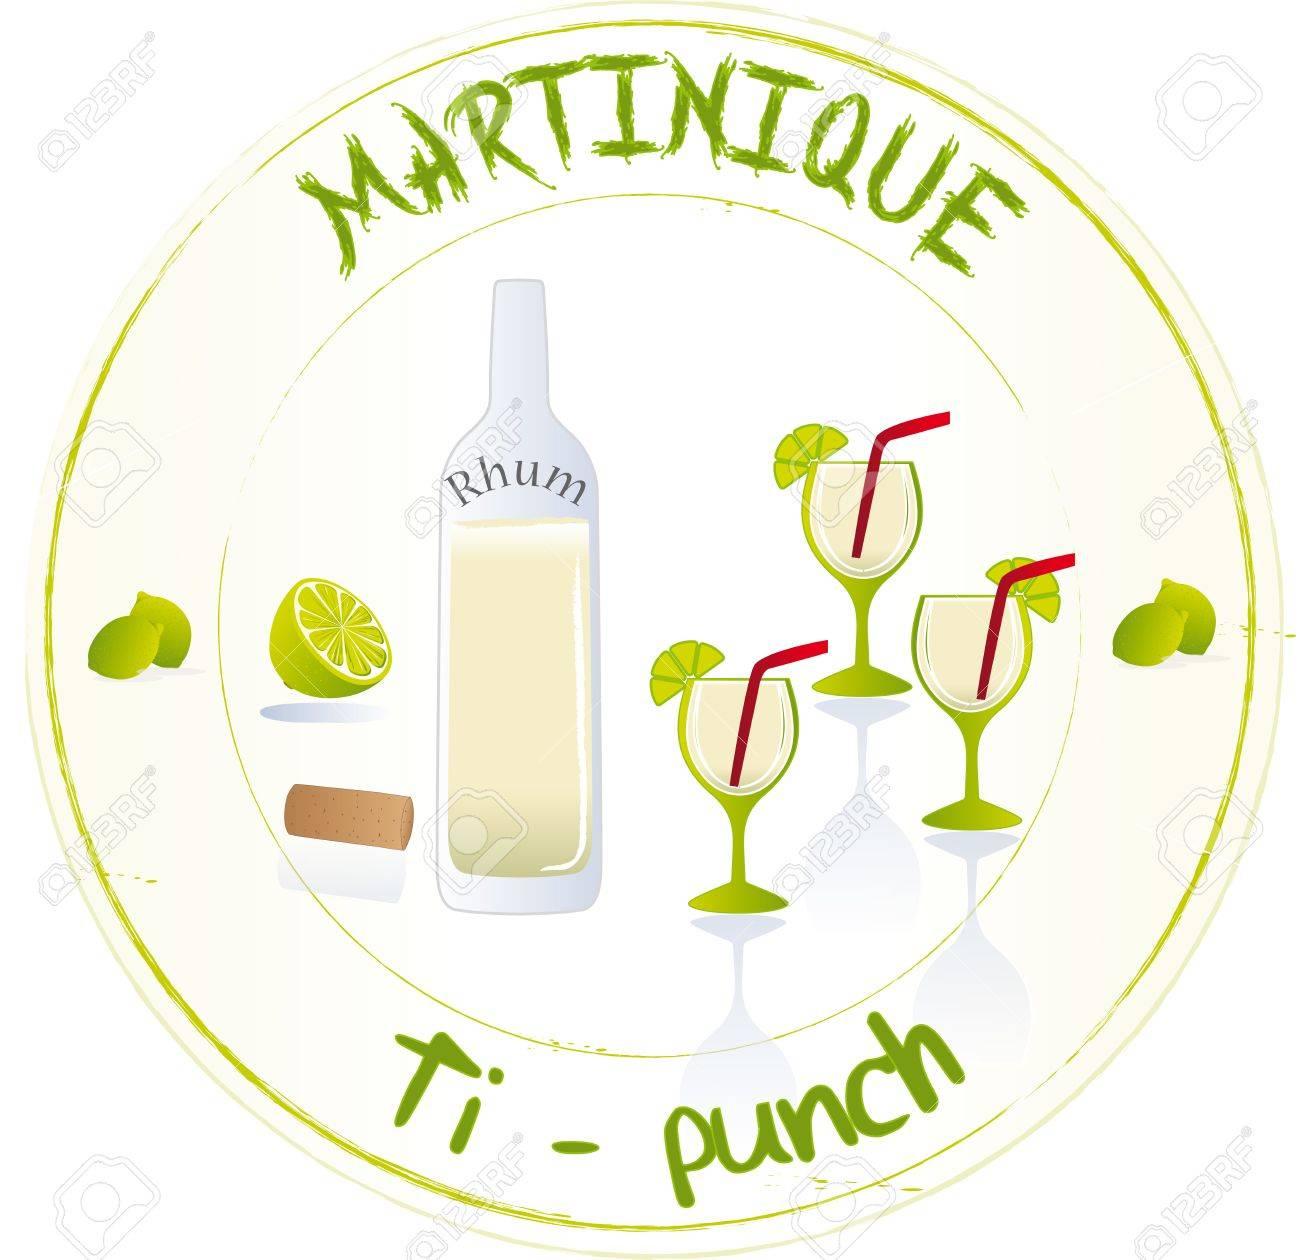 Martinique Ti-punch - 29857461